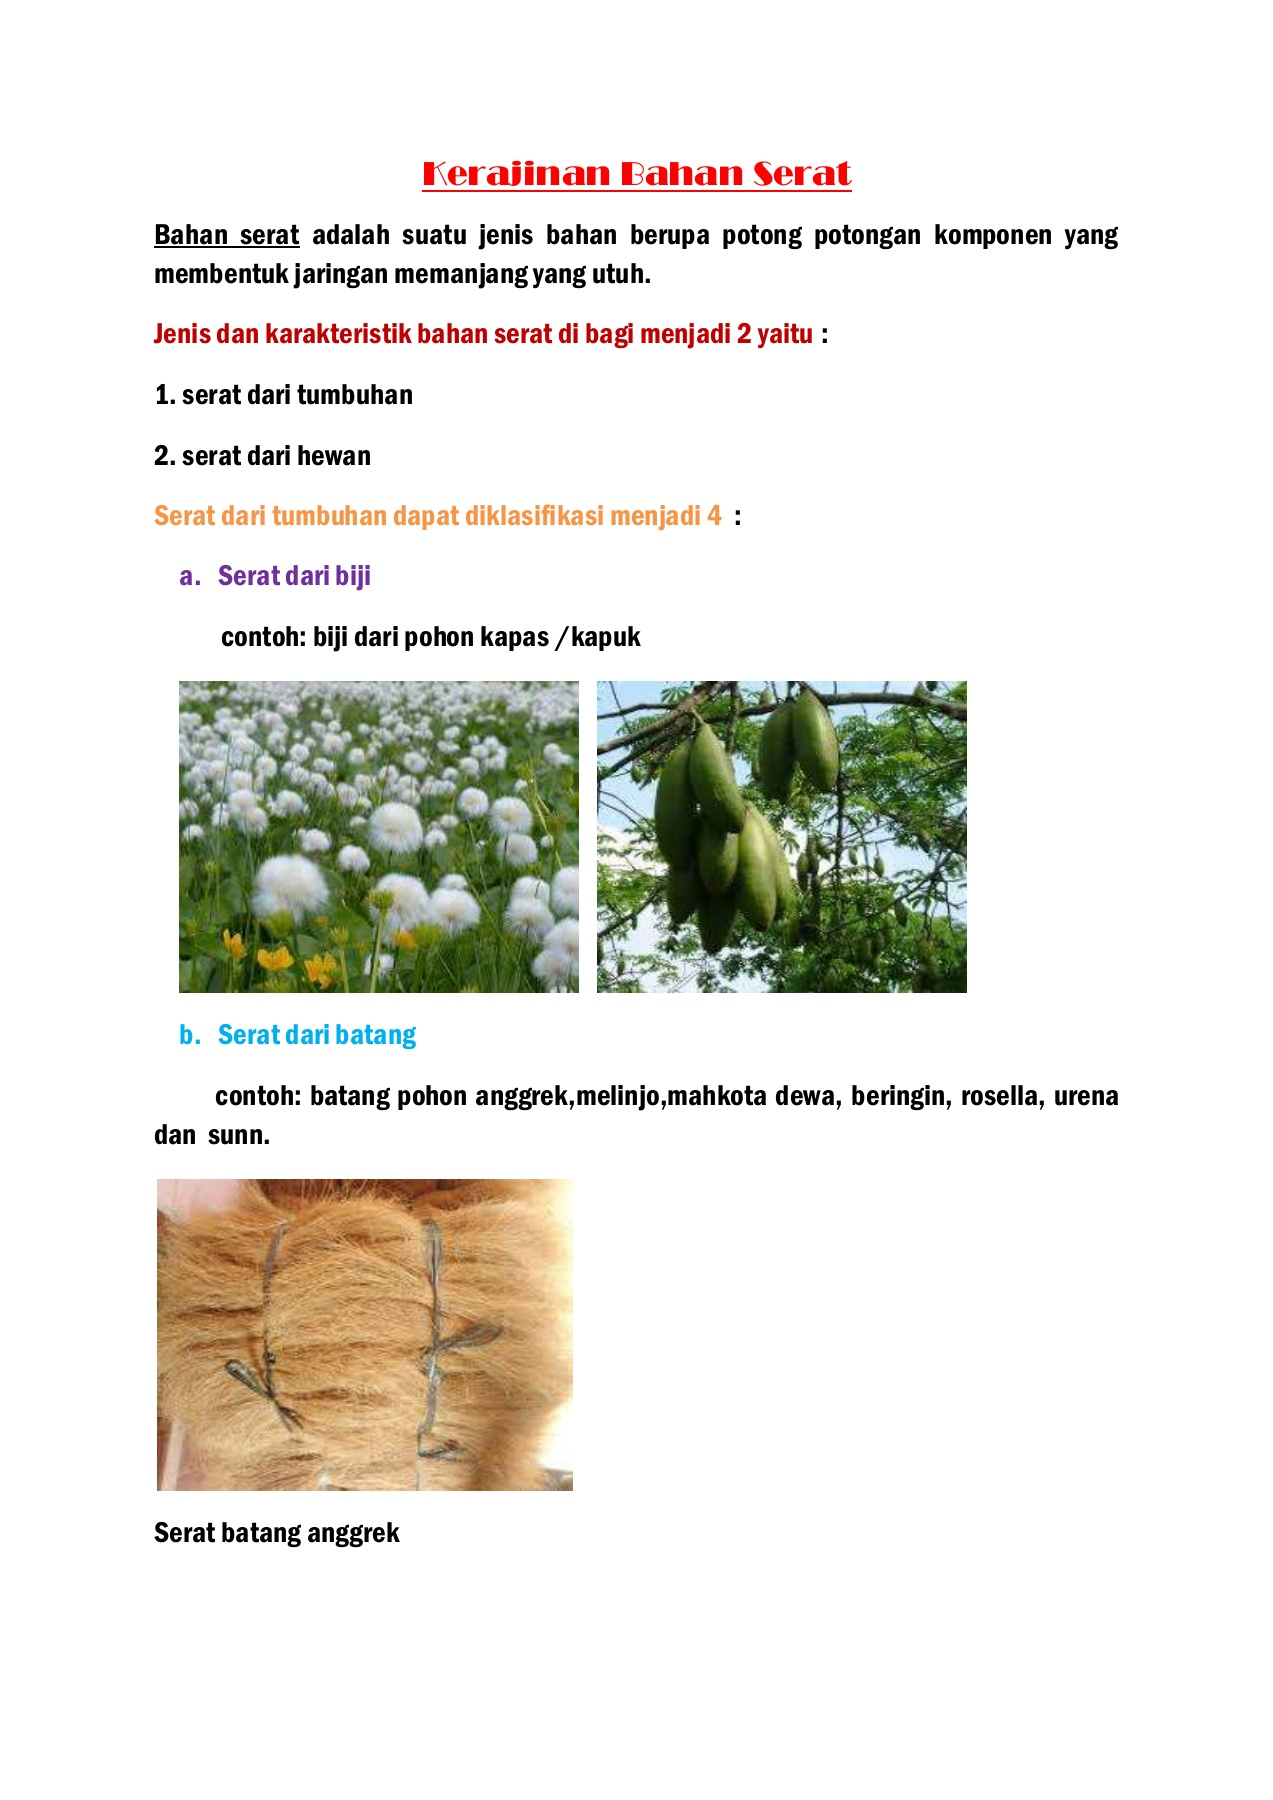 Gambar Serat Batang Anggrek : gambar, serat, batang, anggrek, Ulangan, Harian, I-Flip, EBook, Pages, AnyFlip